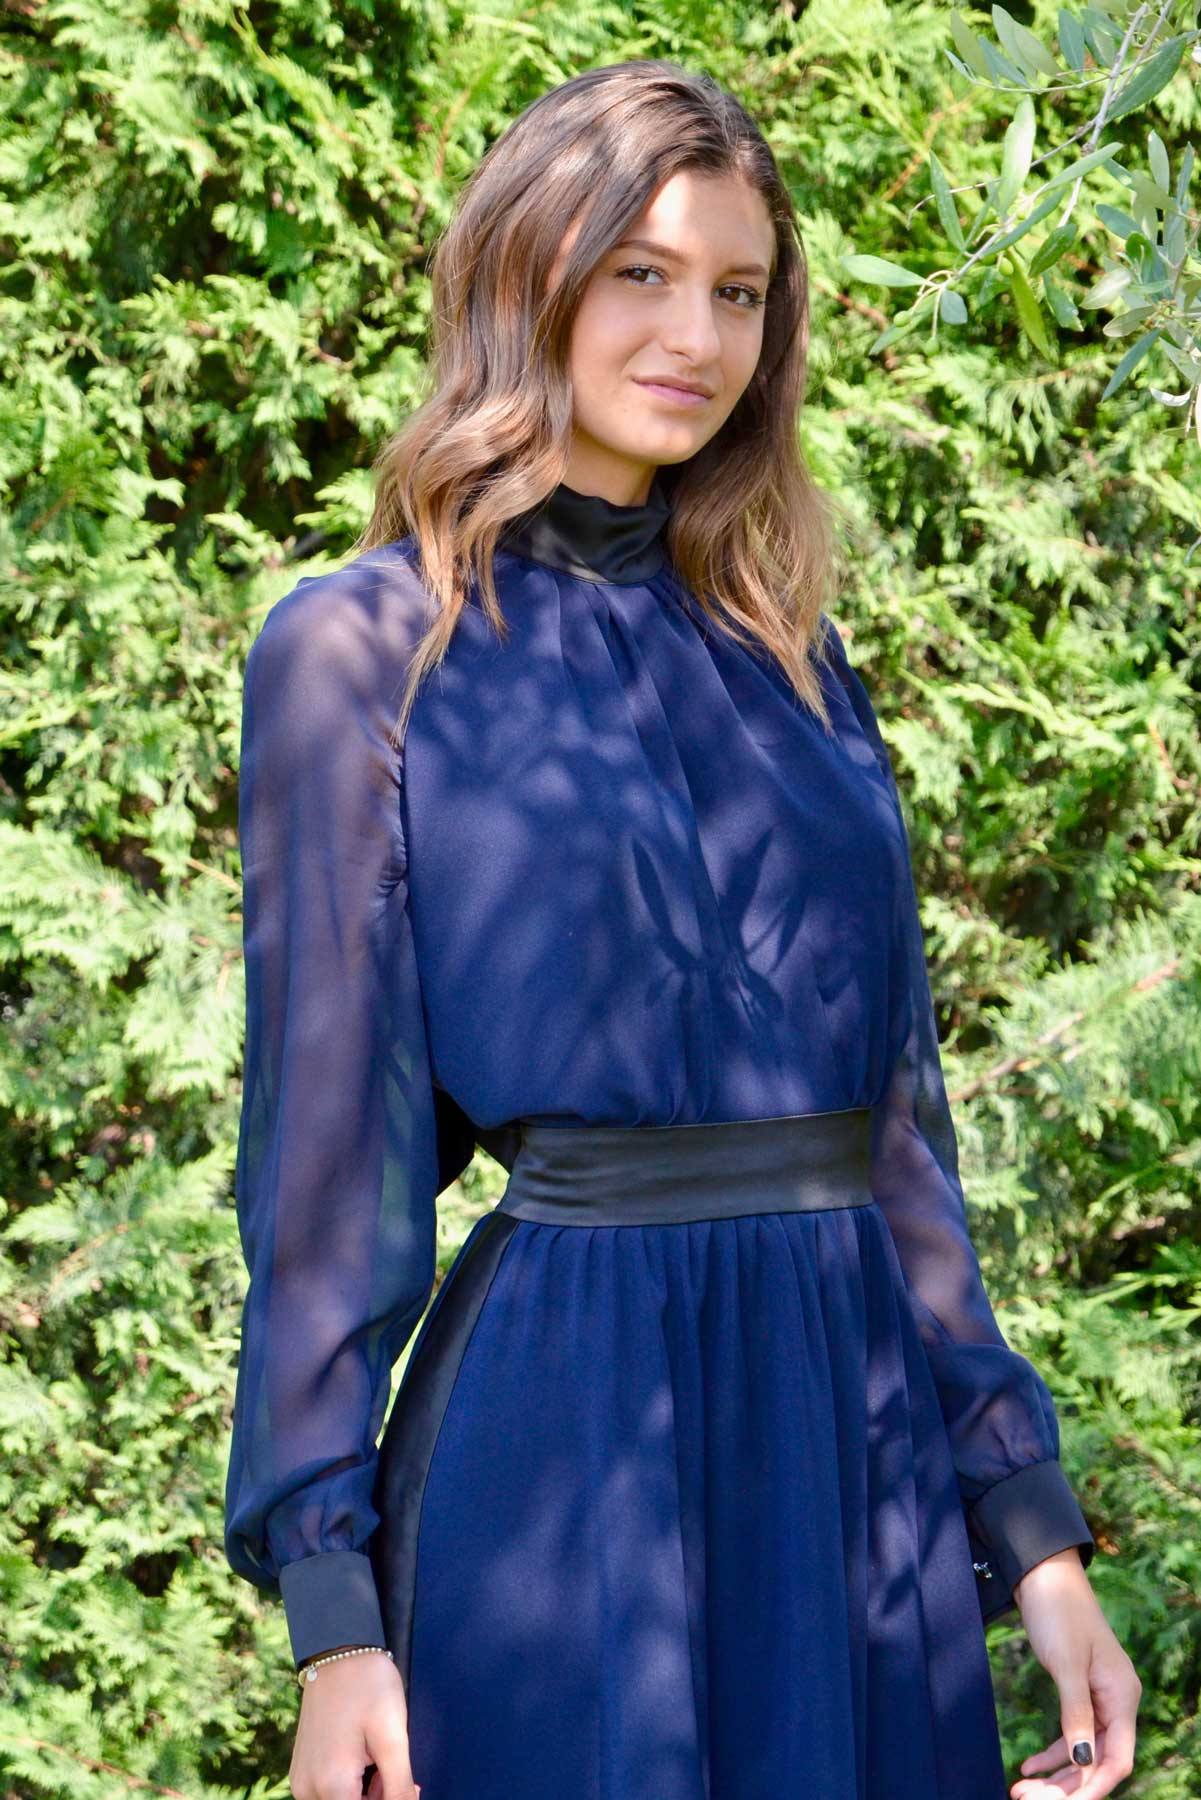 matteo-perin-women-clothing-dress-013.jpg